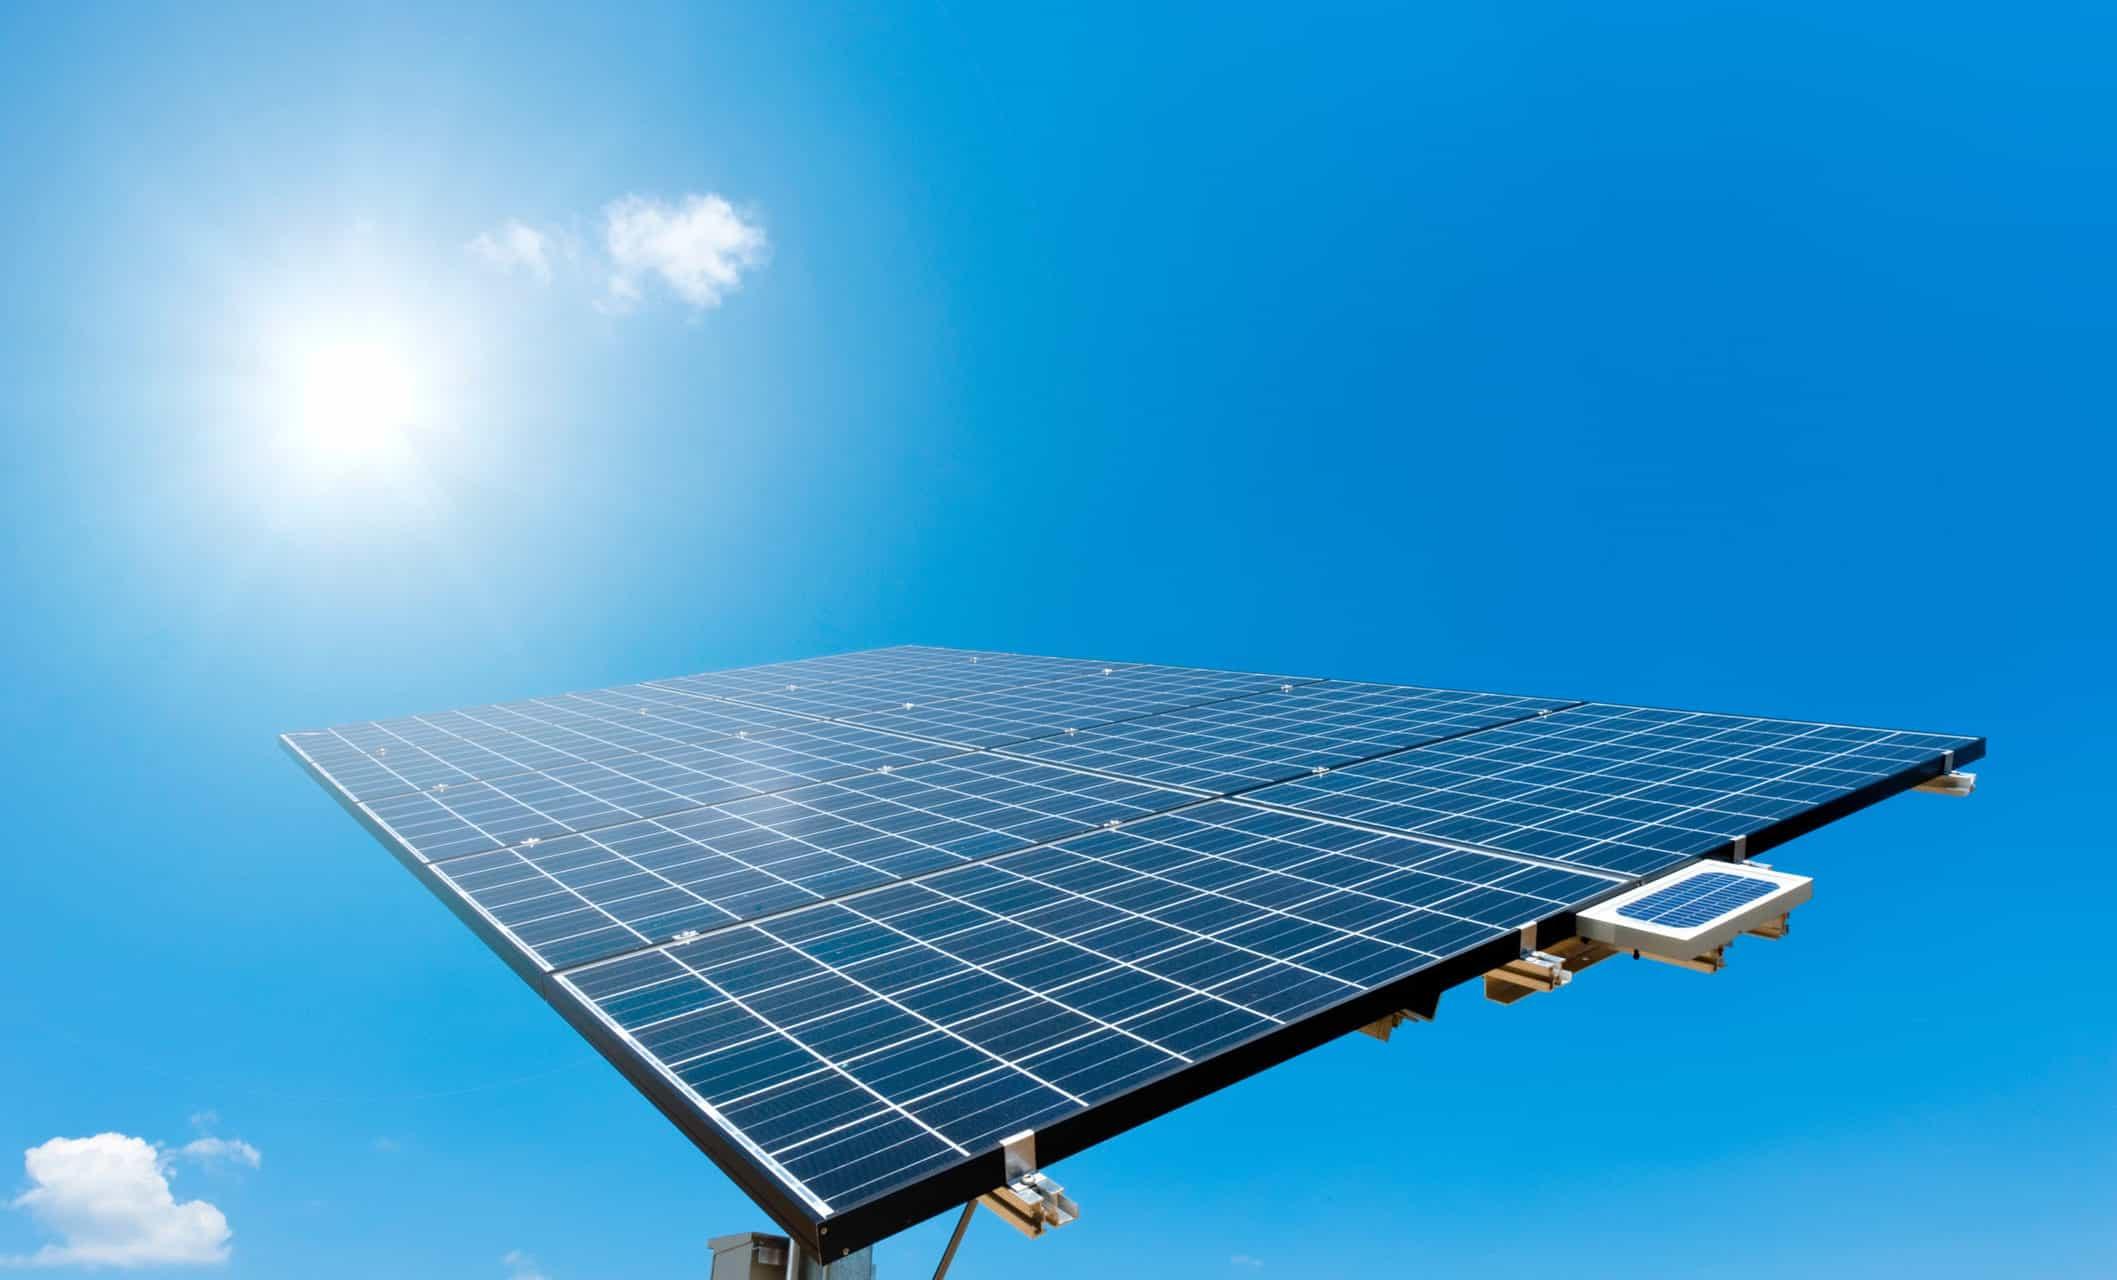 Sun shines on Solar Panel with blue Sky